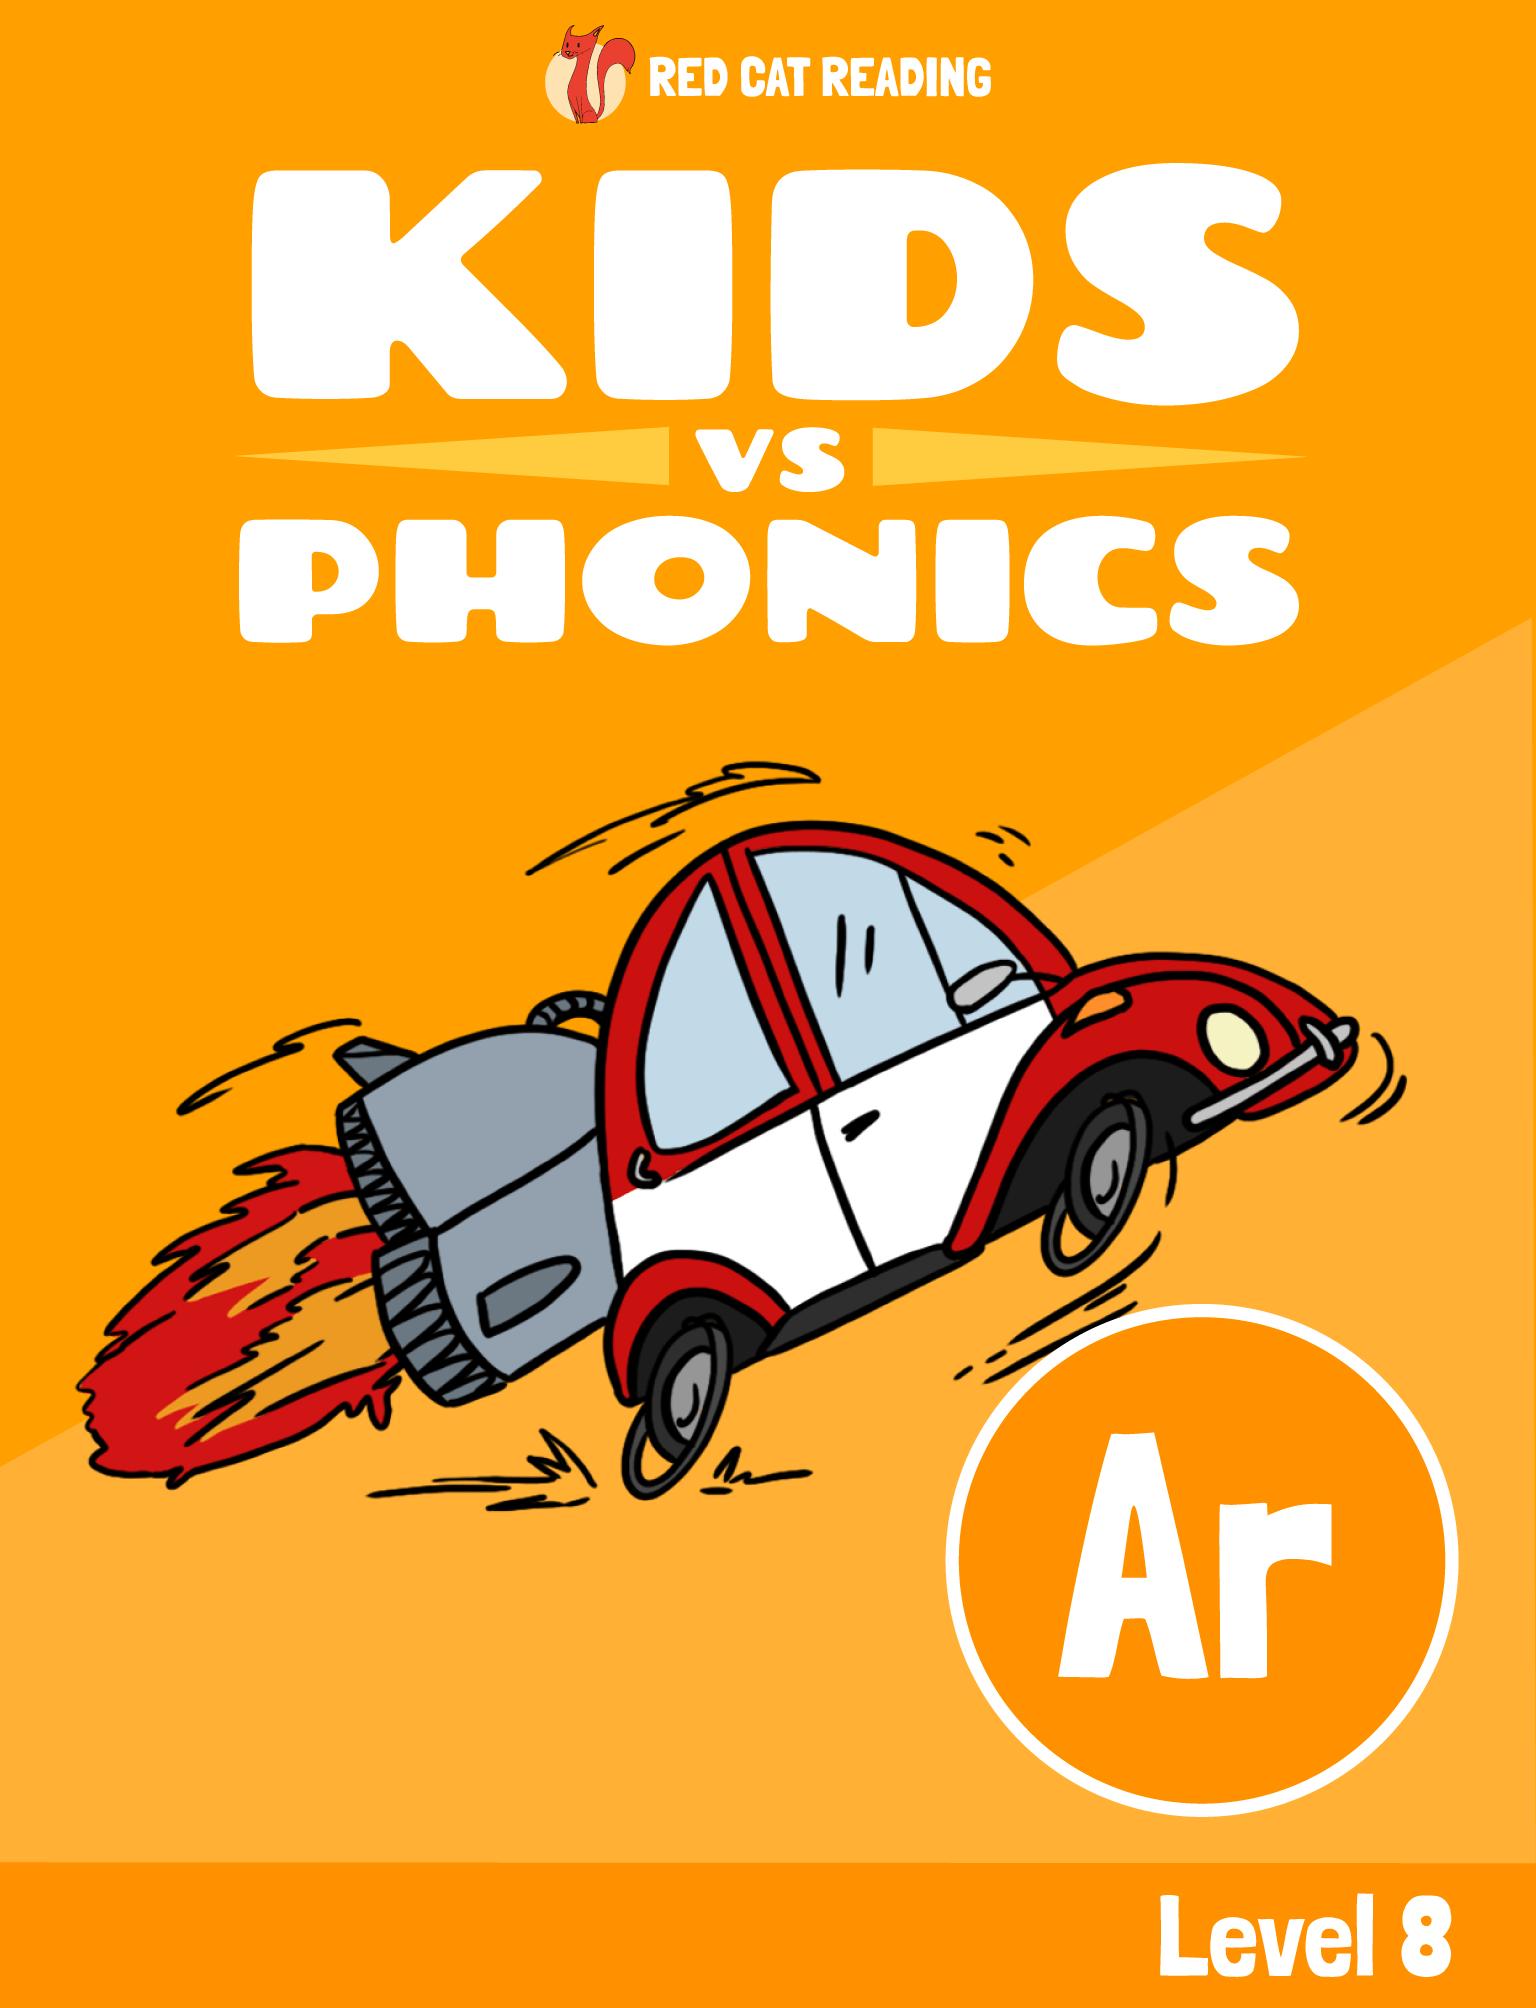 Red Cat Reading Kids vs Phonics Phonics Sound AR Kids Learn to Read